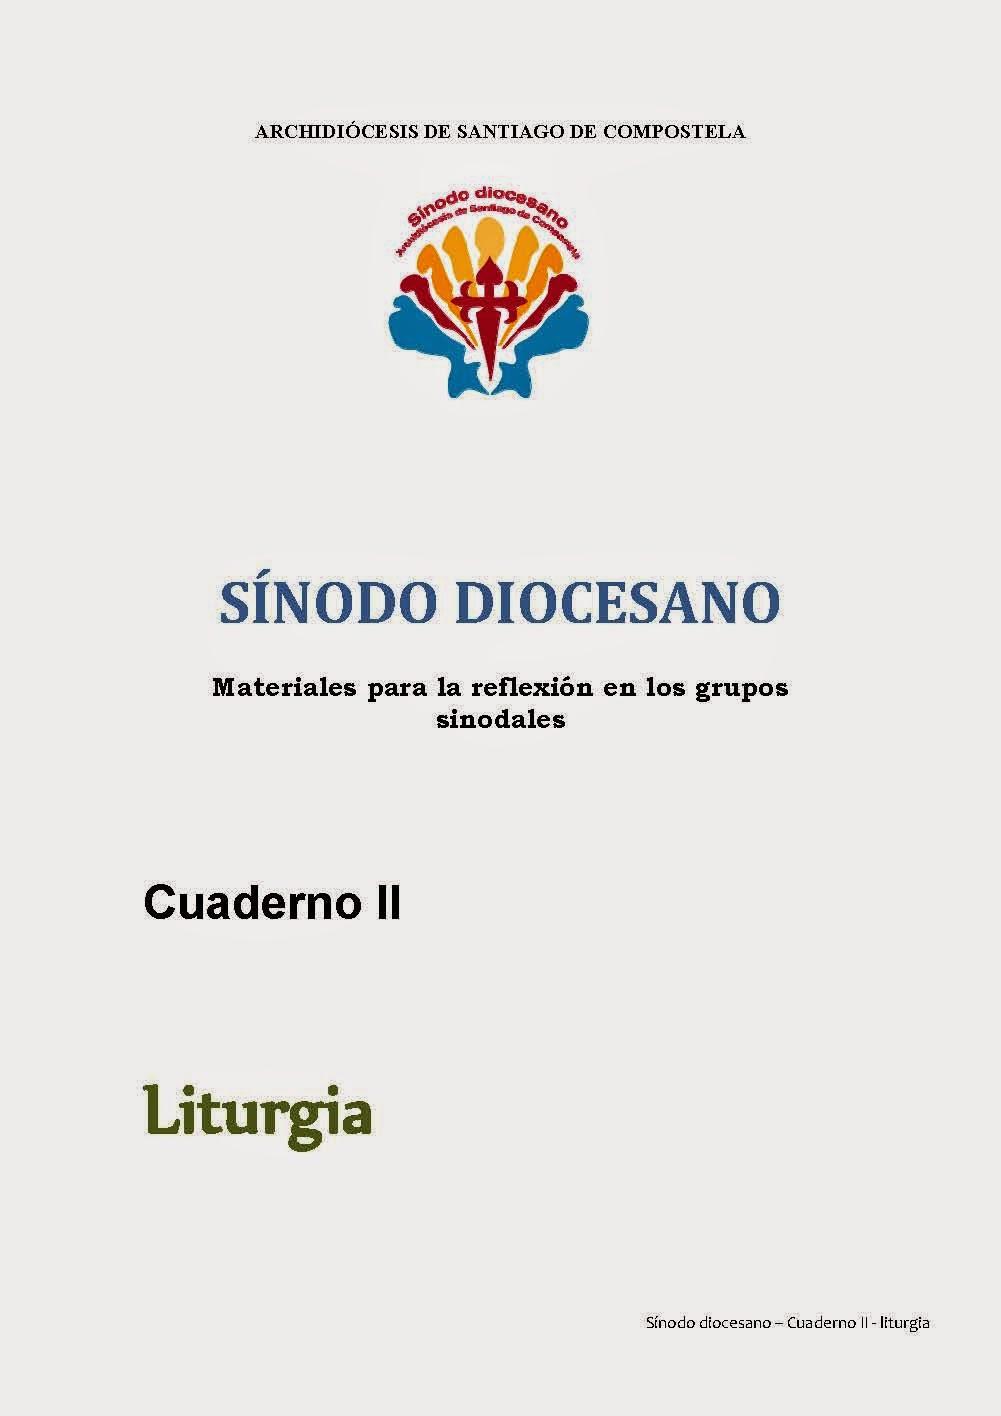 www.archicompostela.org/Comun/sinodo-diocesano/Cuaderno_II_liturgia.pdf